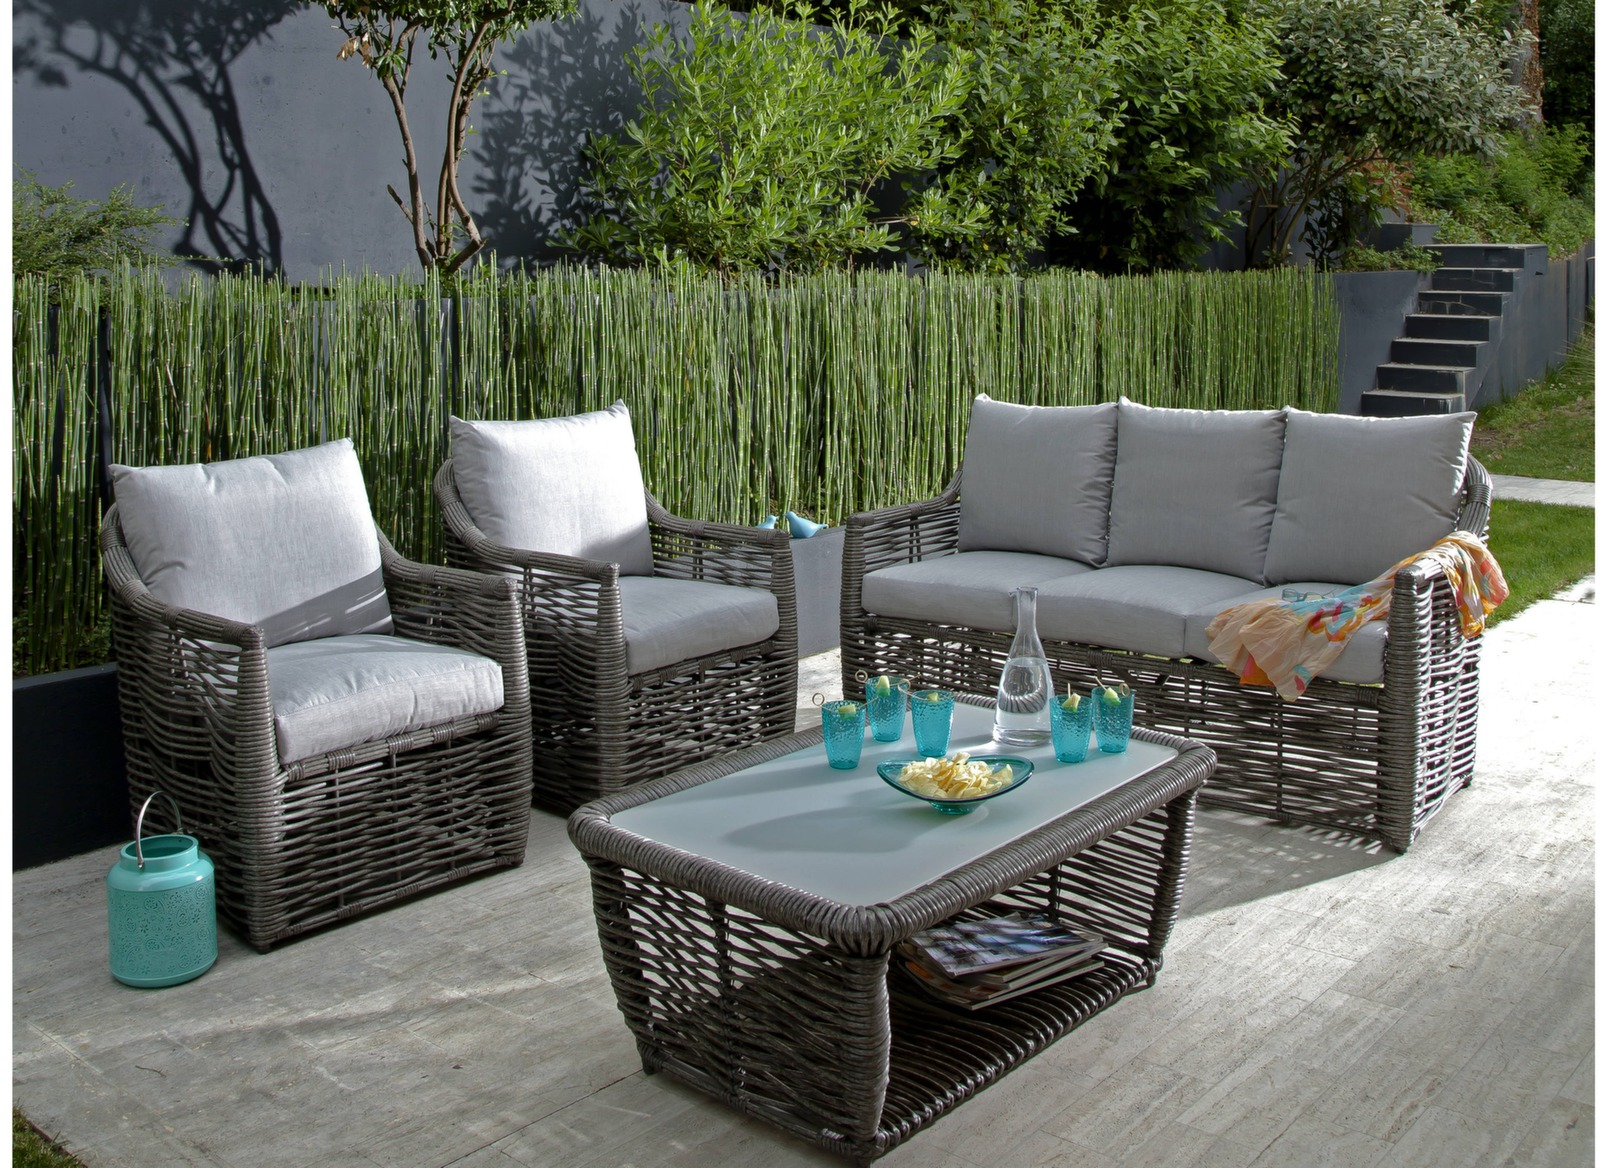 Fauteuil d tente cane fauteuils de jardin oc o sp cialiste du mobilier - Fauteuil detente jardin ...